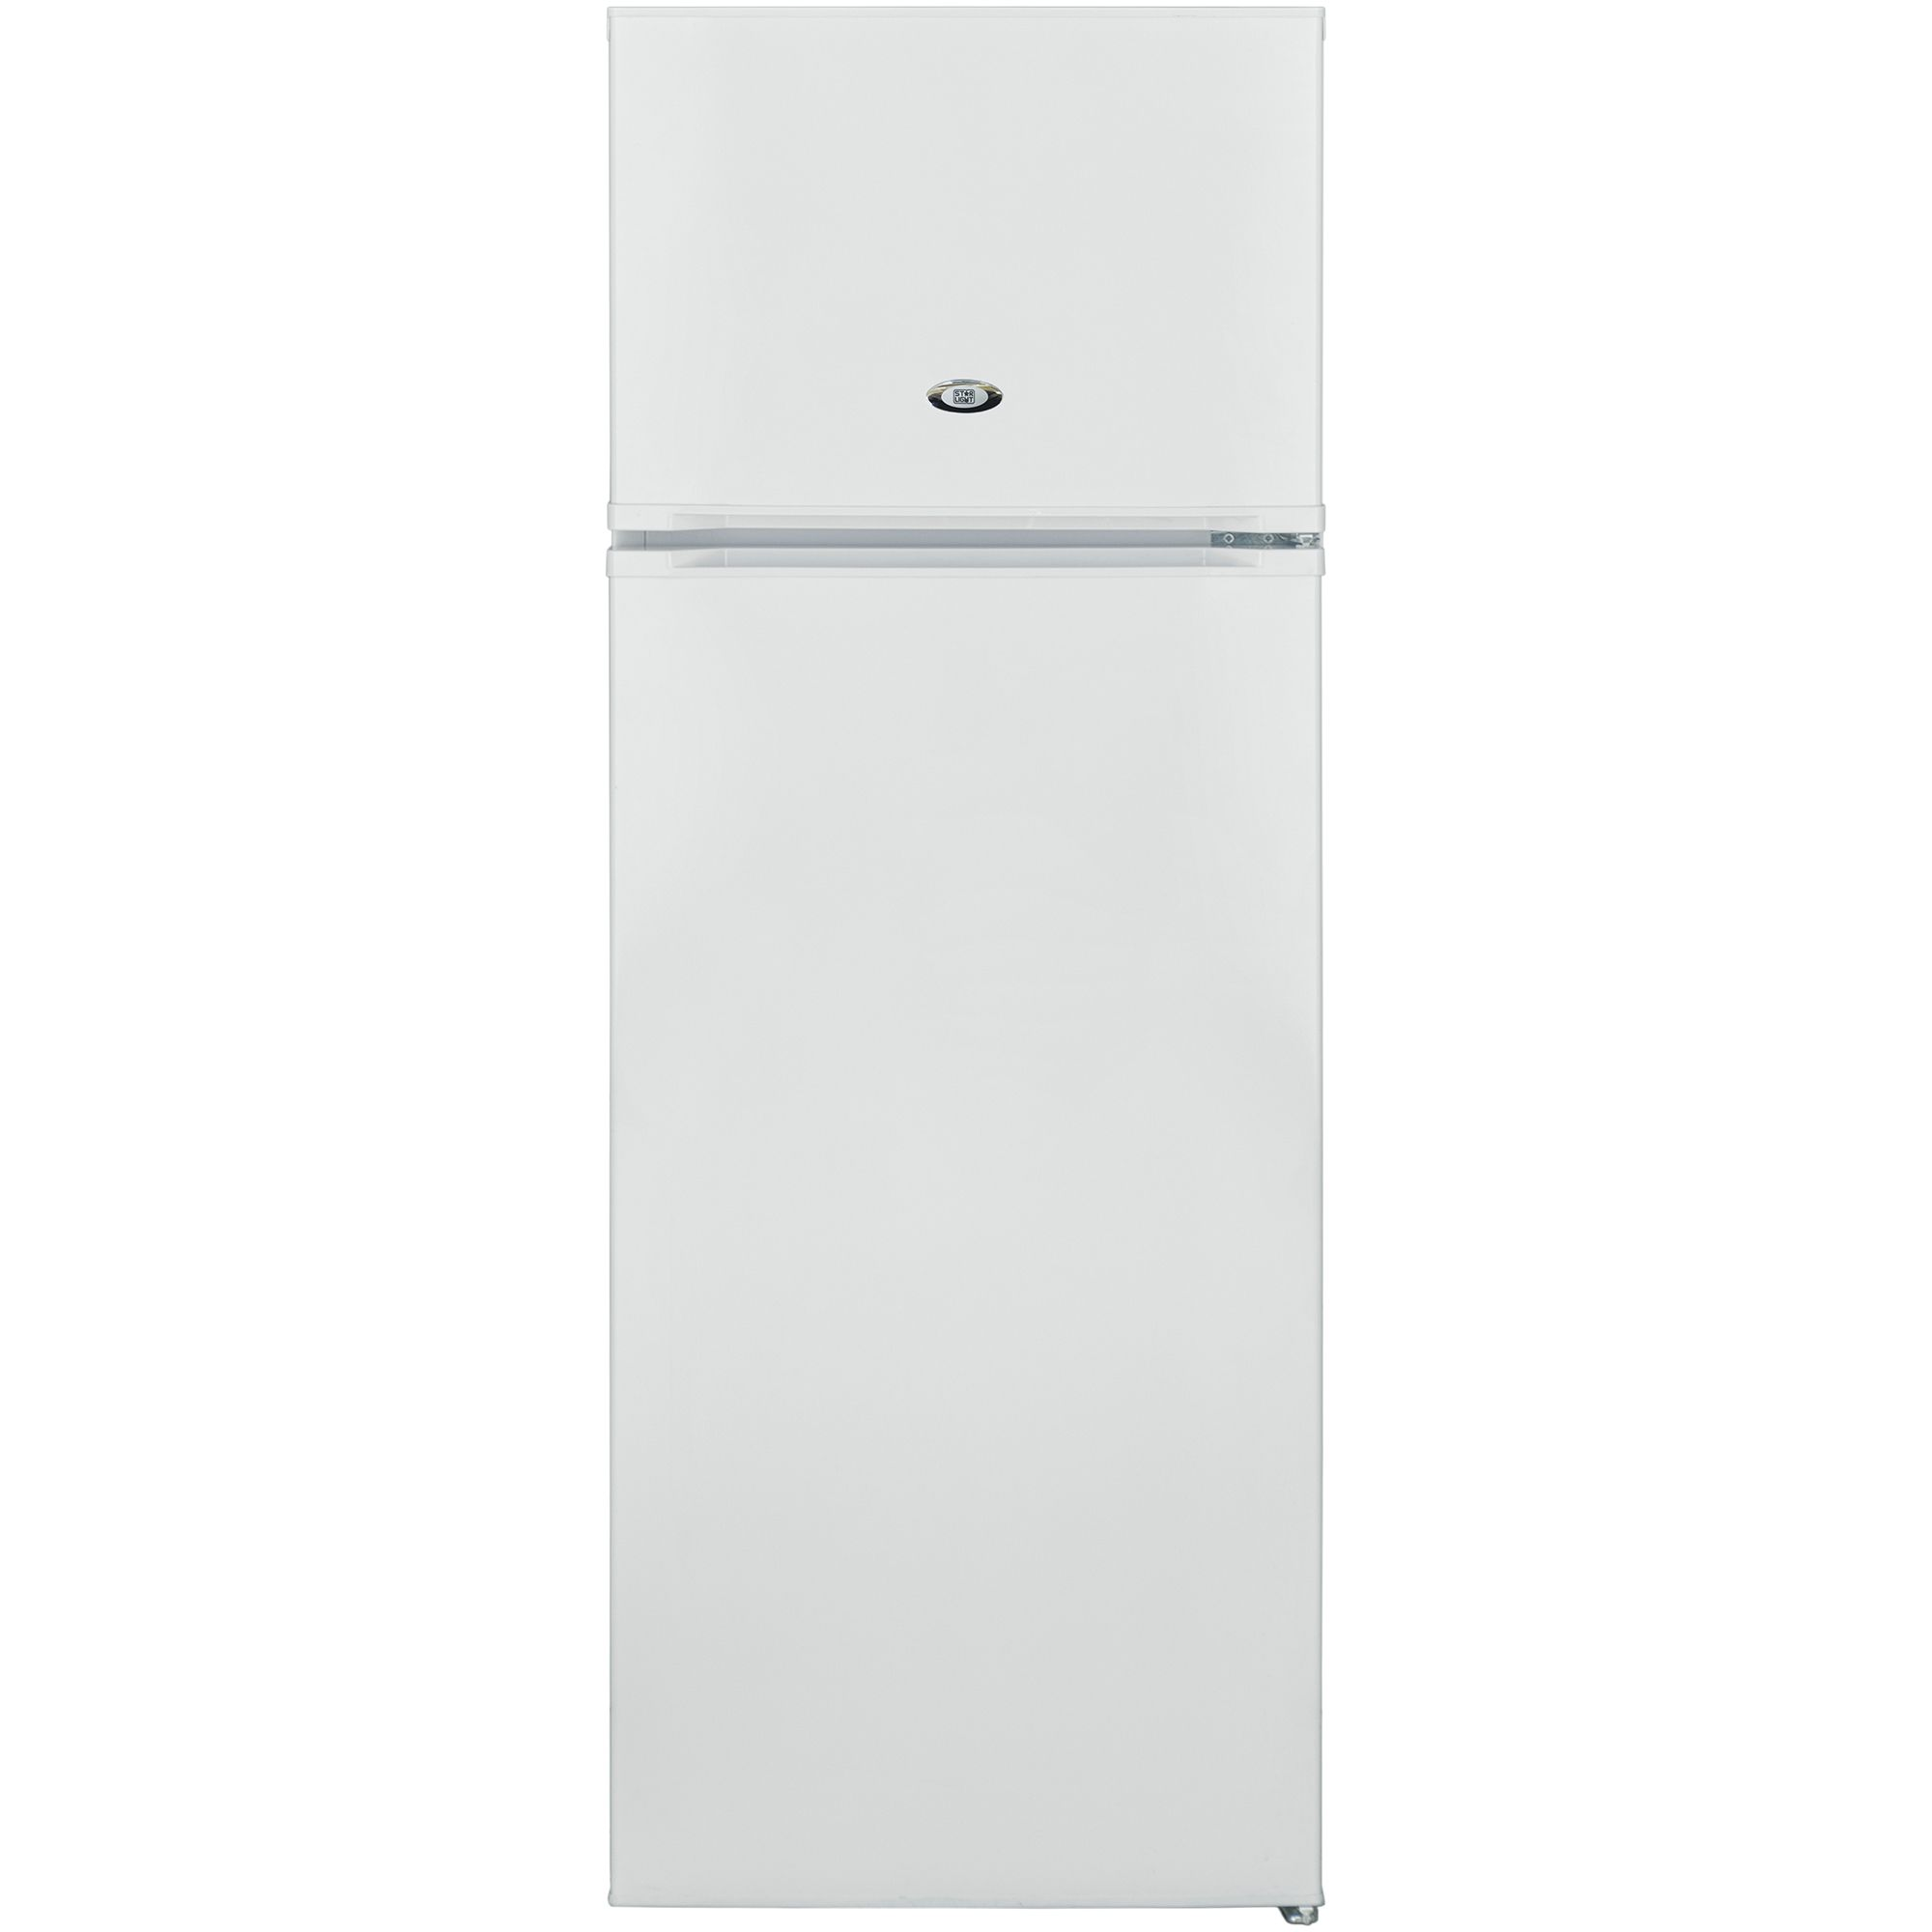 Хладилник с 2 врати Star-Light FDDV-213A+, 213 л, Клас A+, H 144 cм, Бял